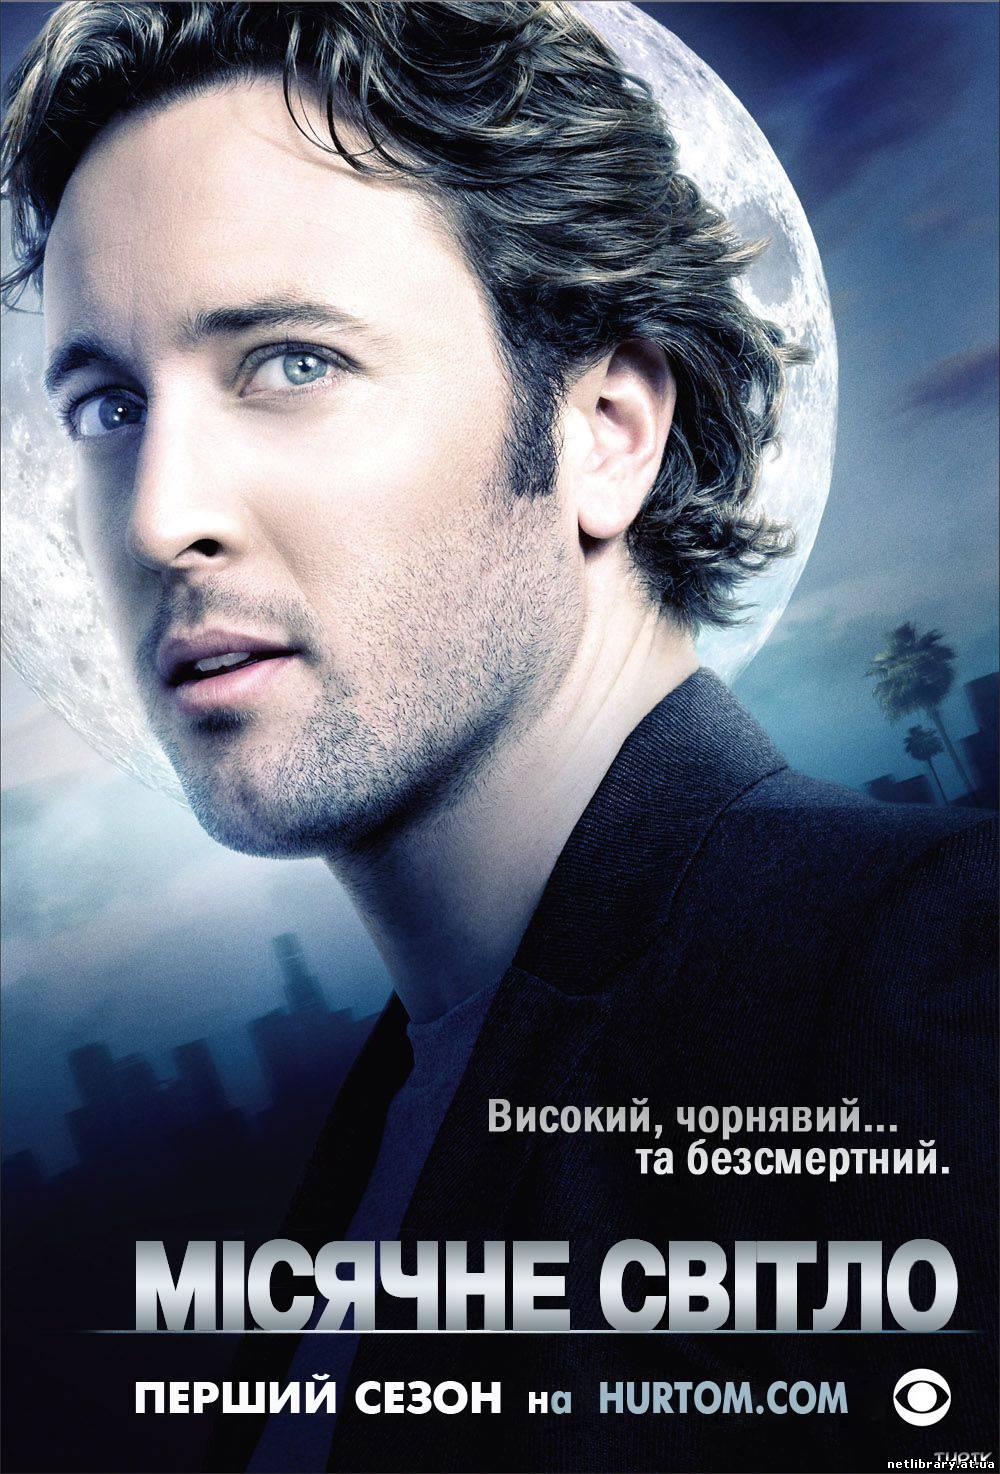 Мiсячне Свiтло (1 Сезон) / Moonlight (Season 1) (2007) укр дубляж онлайн